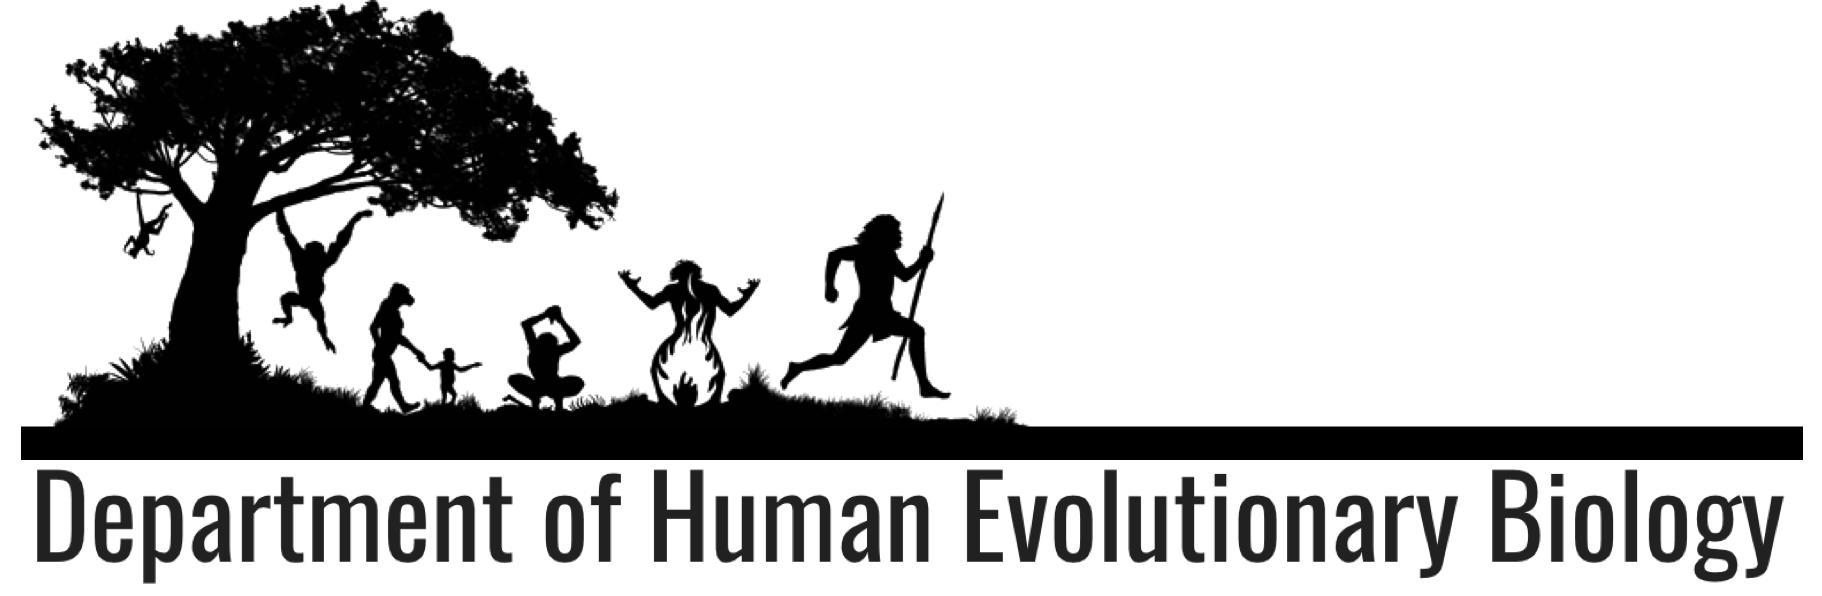 Department of Human Evolutionary Biology